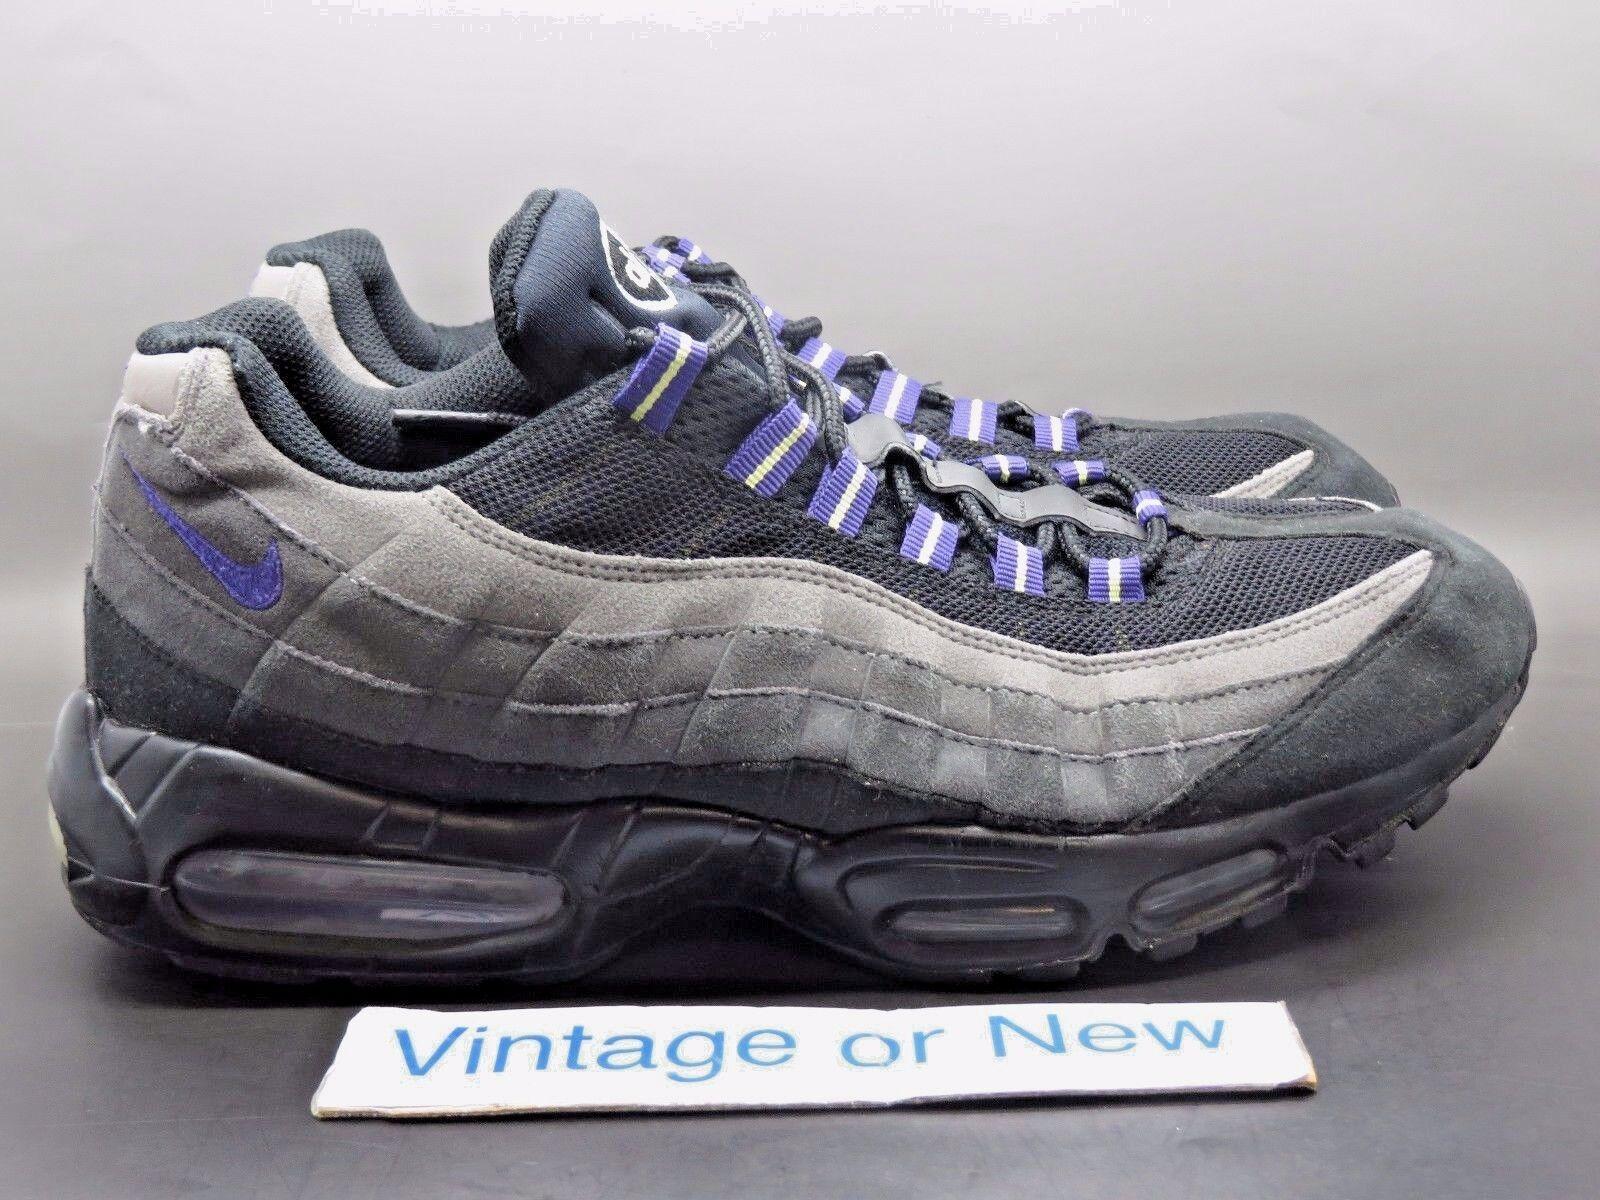 Nike air max 95 uomini ombra medio grey viola 2011 sz